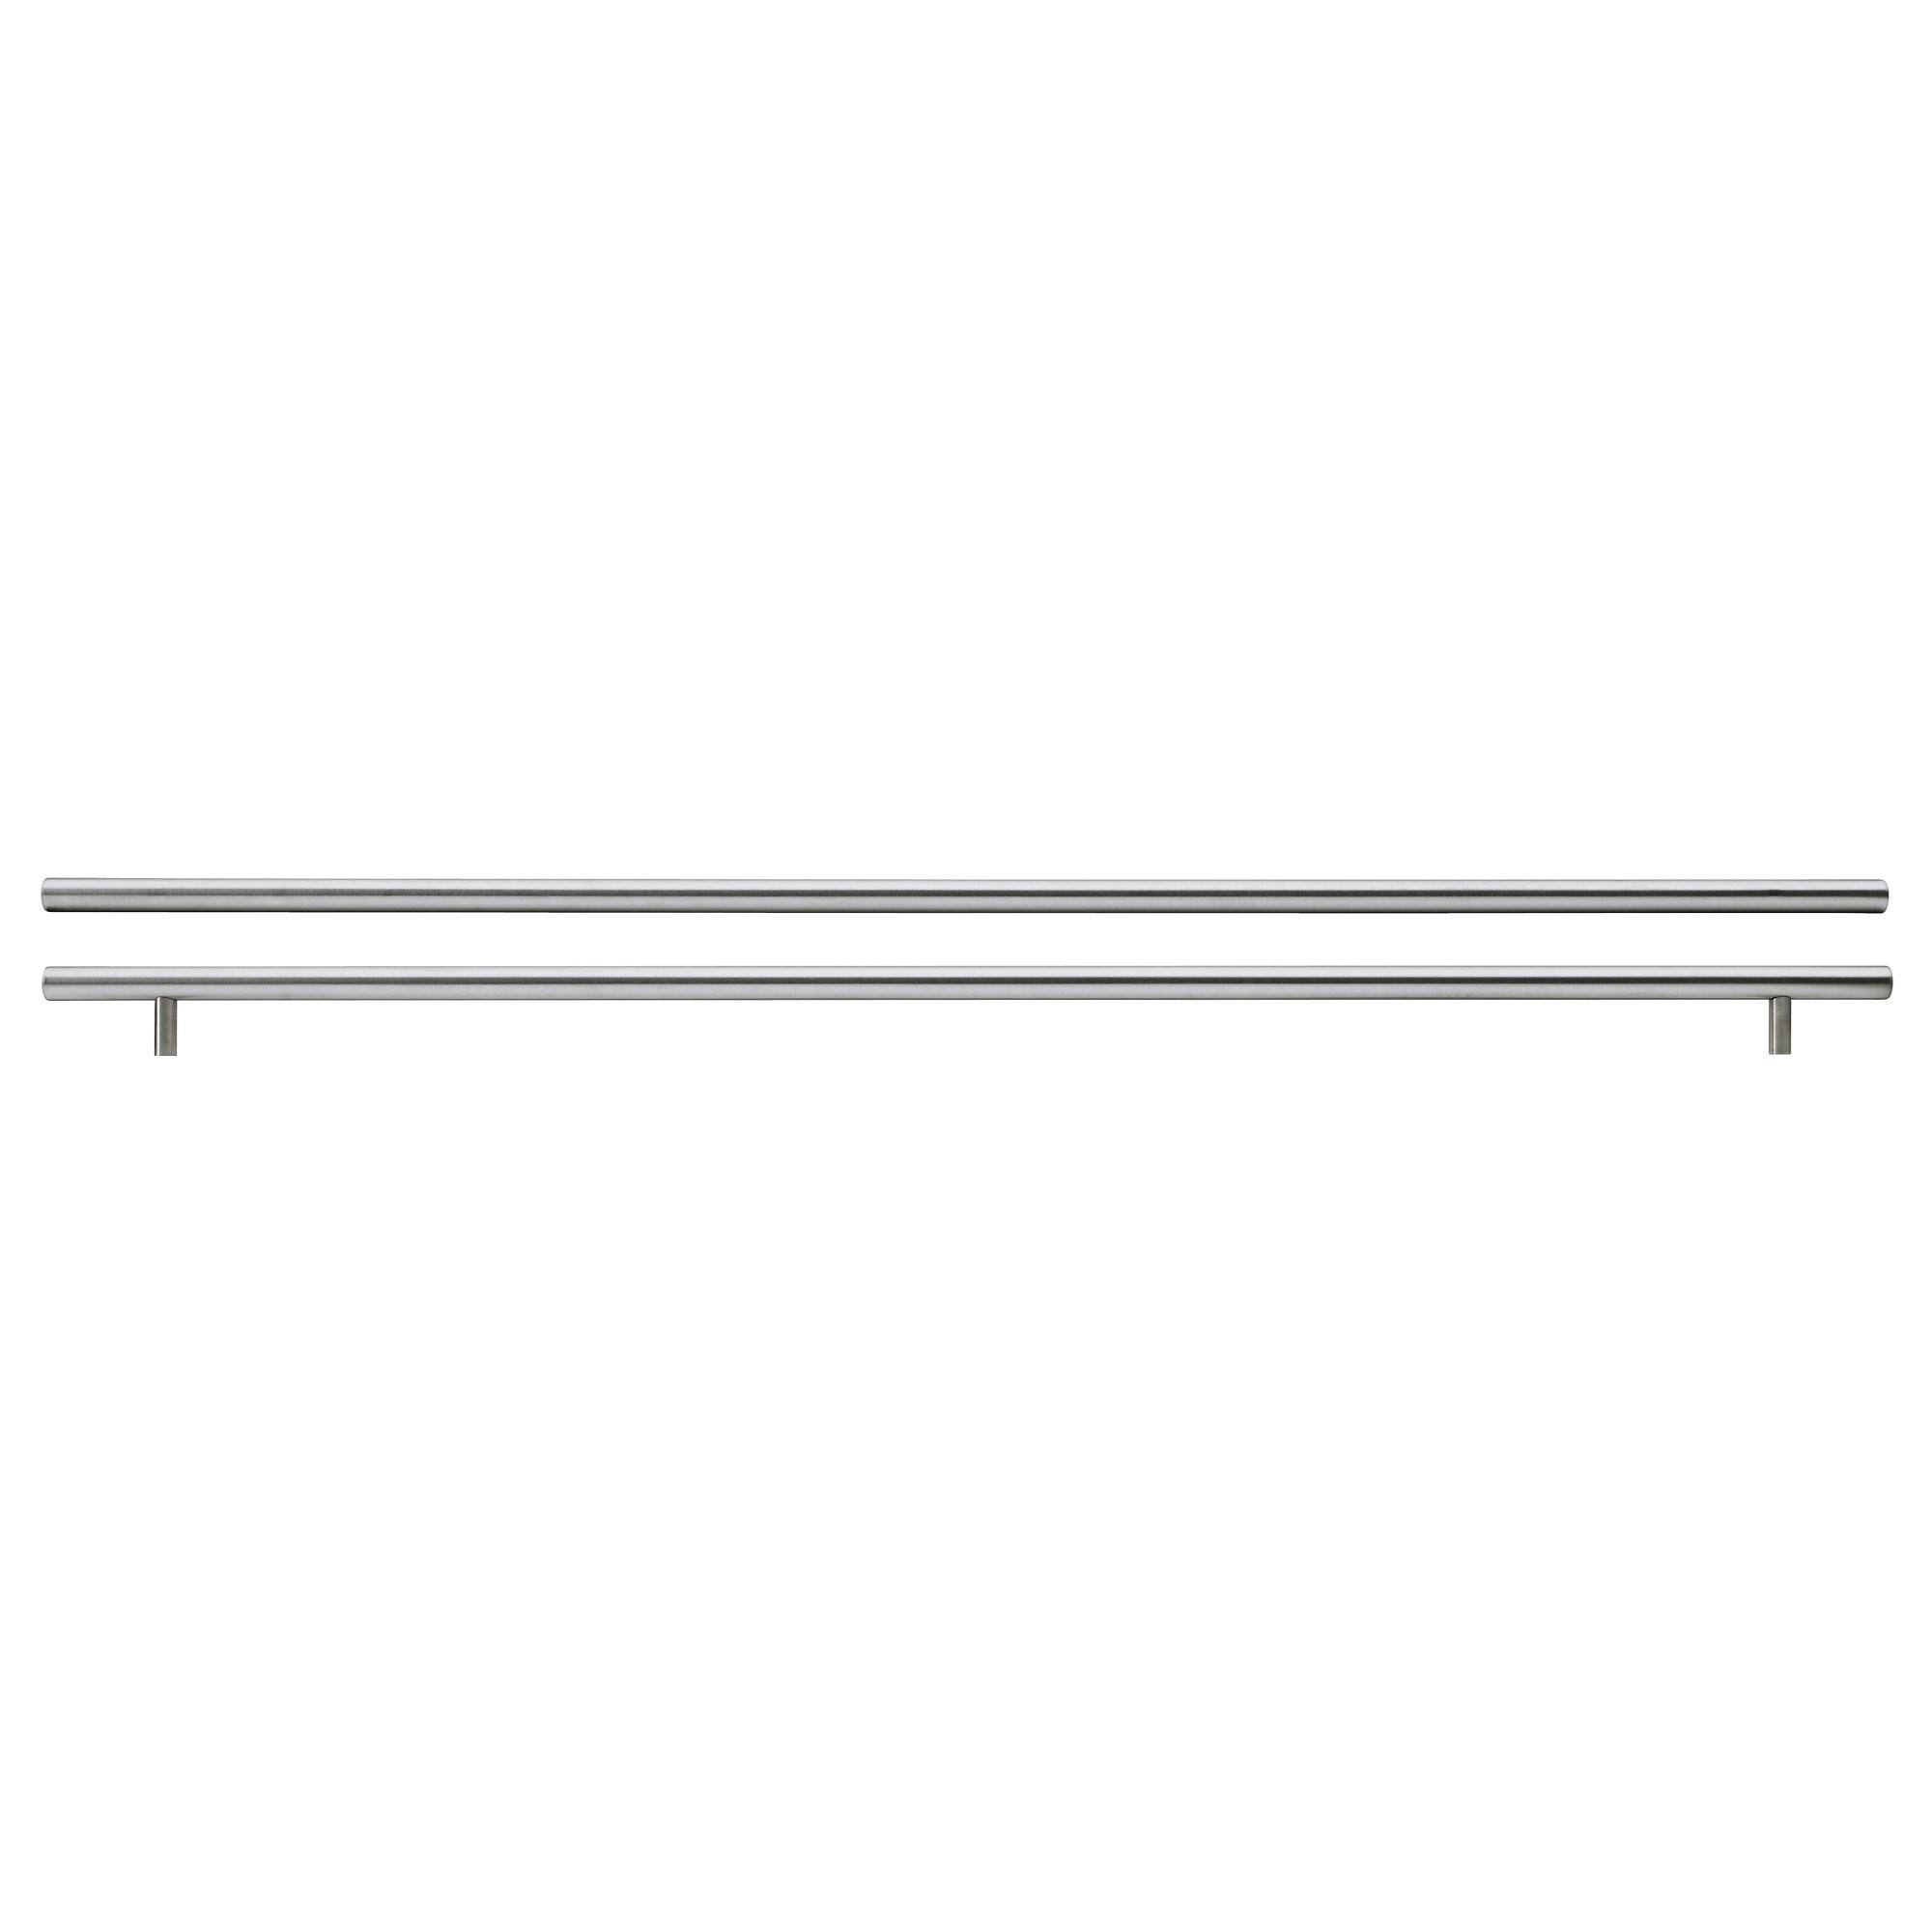 LANSA handle stainless steel 845 mm